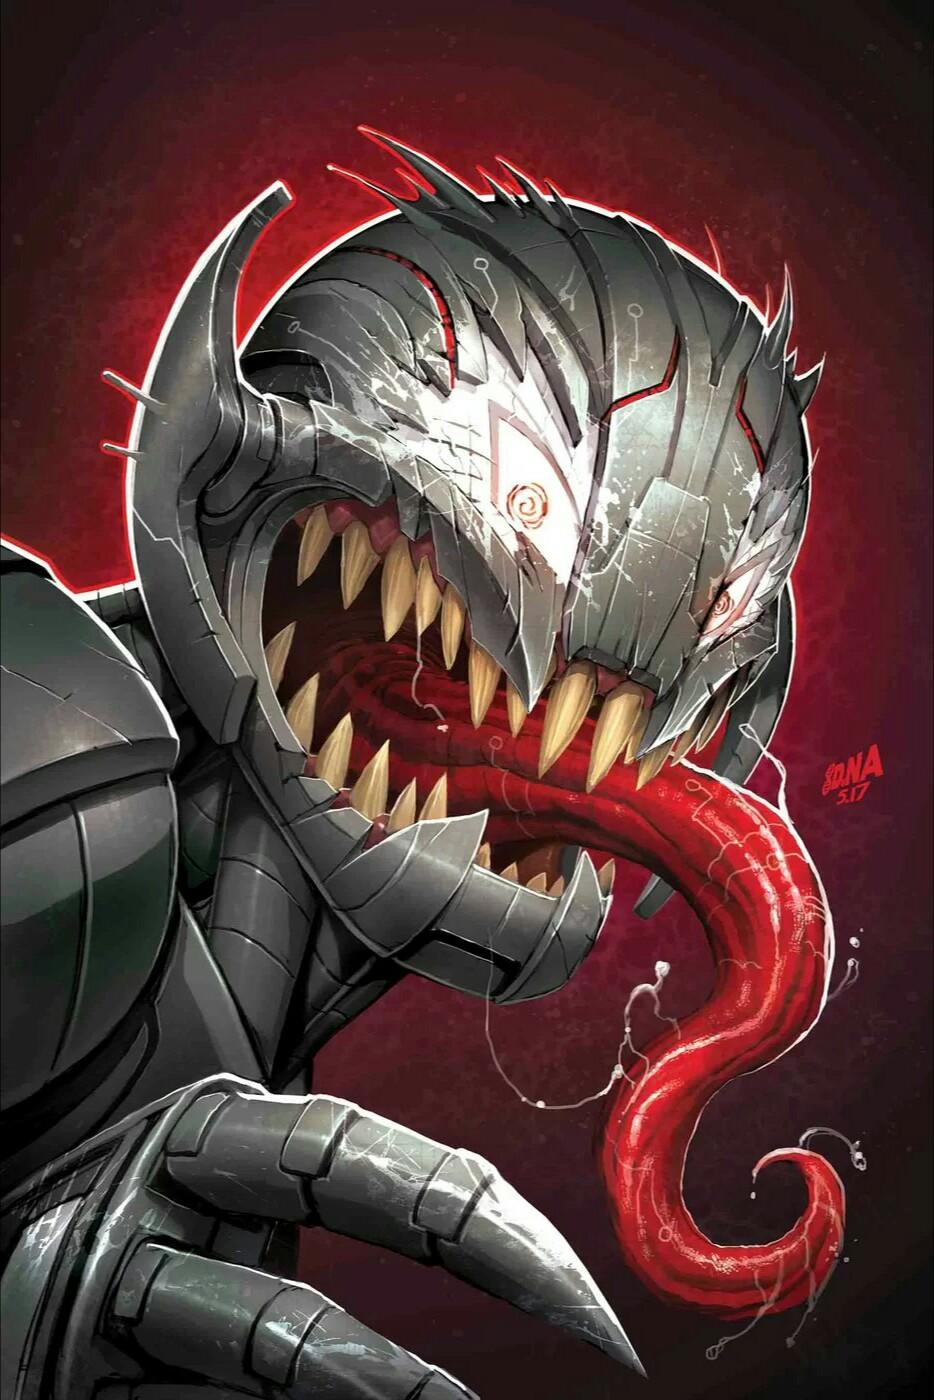 Champions Vol 2 12 Venomized Ultron Variant Textless.jpg